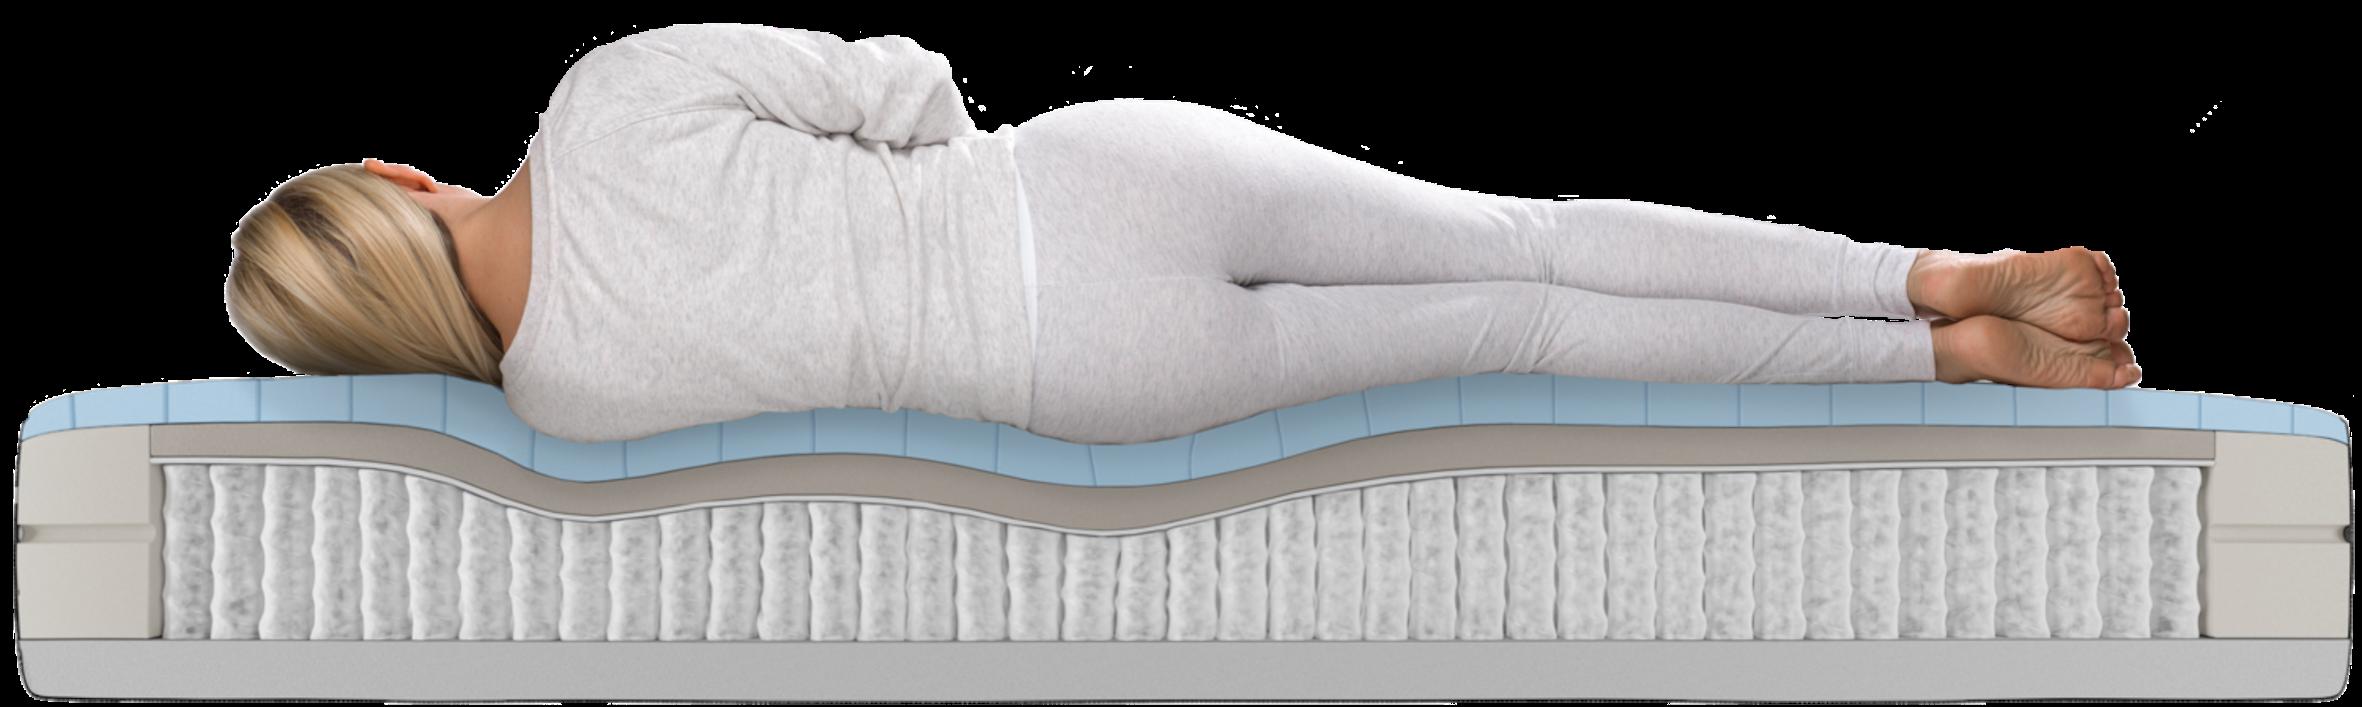 Best Mattress For Side Sleepers Uk Hybrid Mattress For